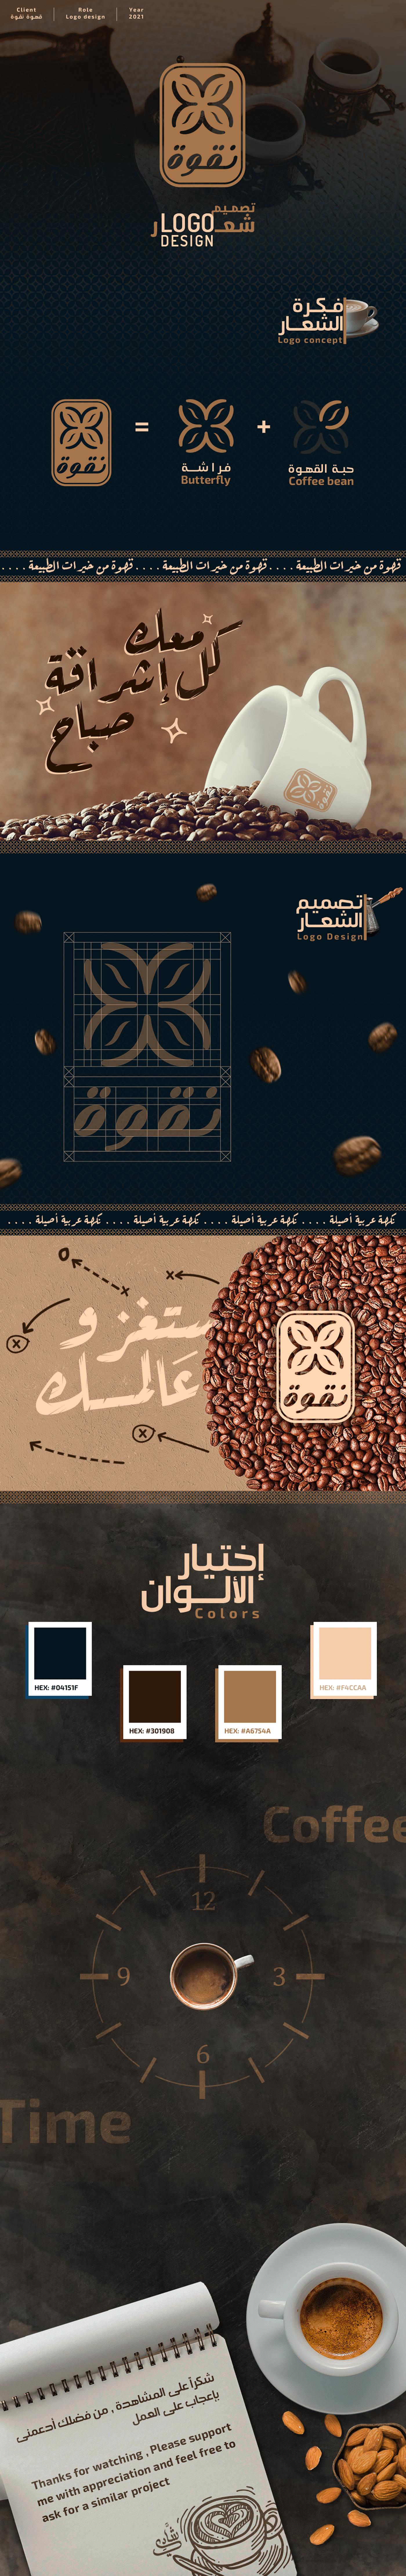 branding  Coffee design elegant identity Logo Design product Social Media Designs typography   visual identity